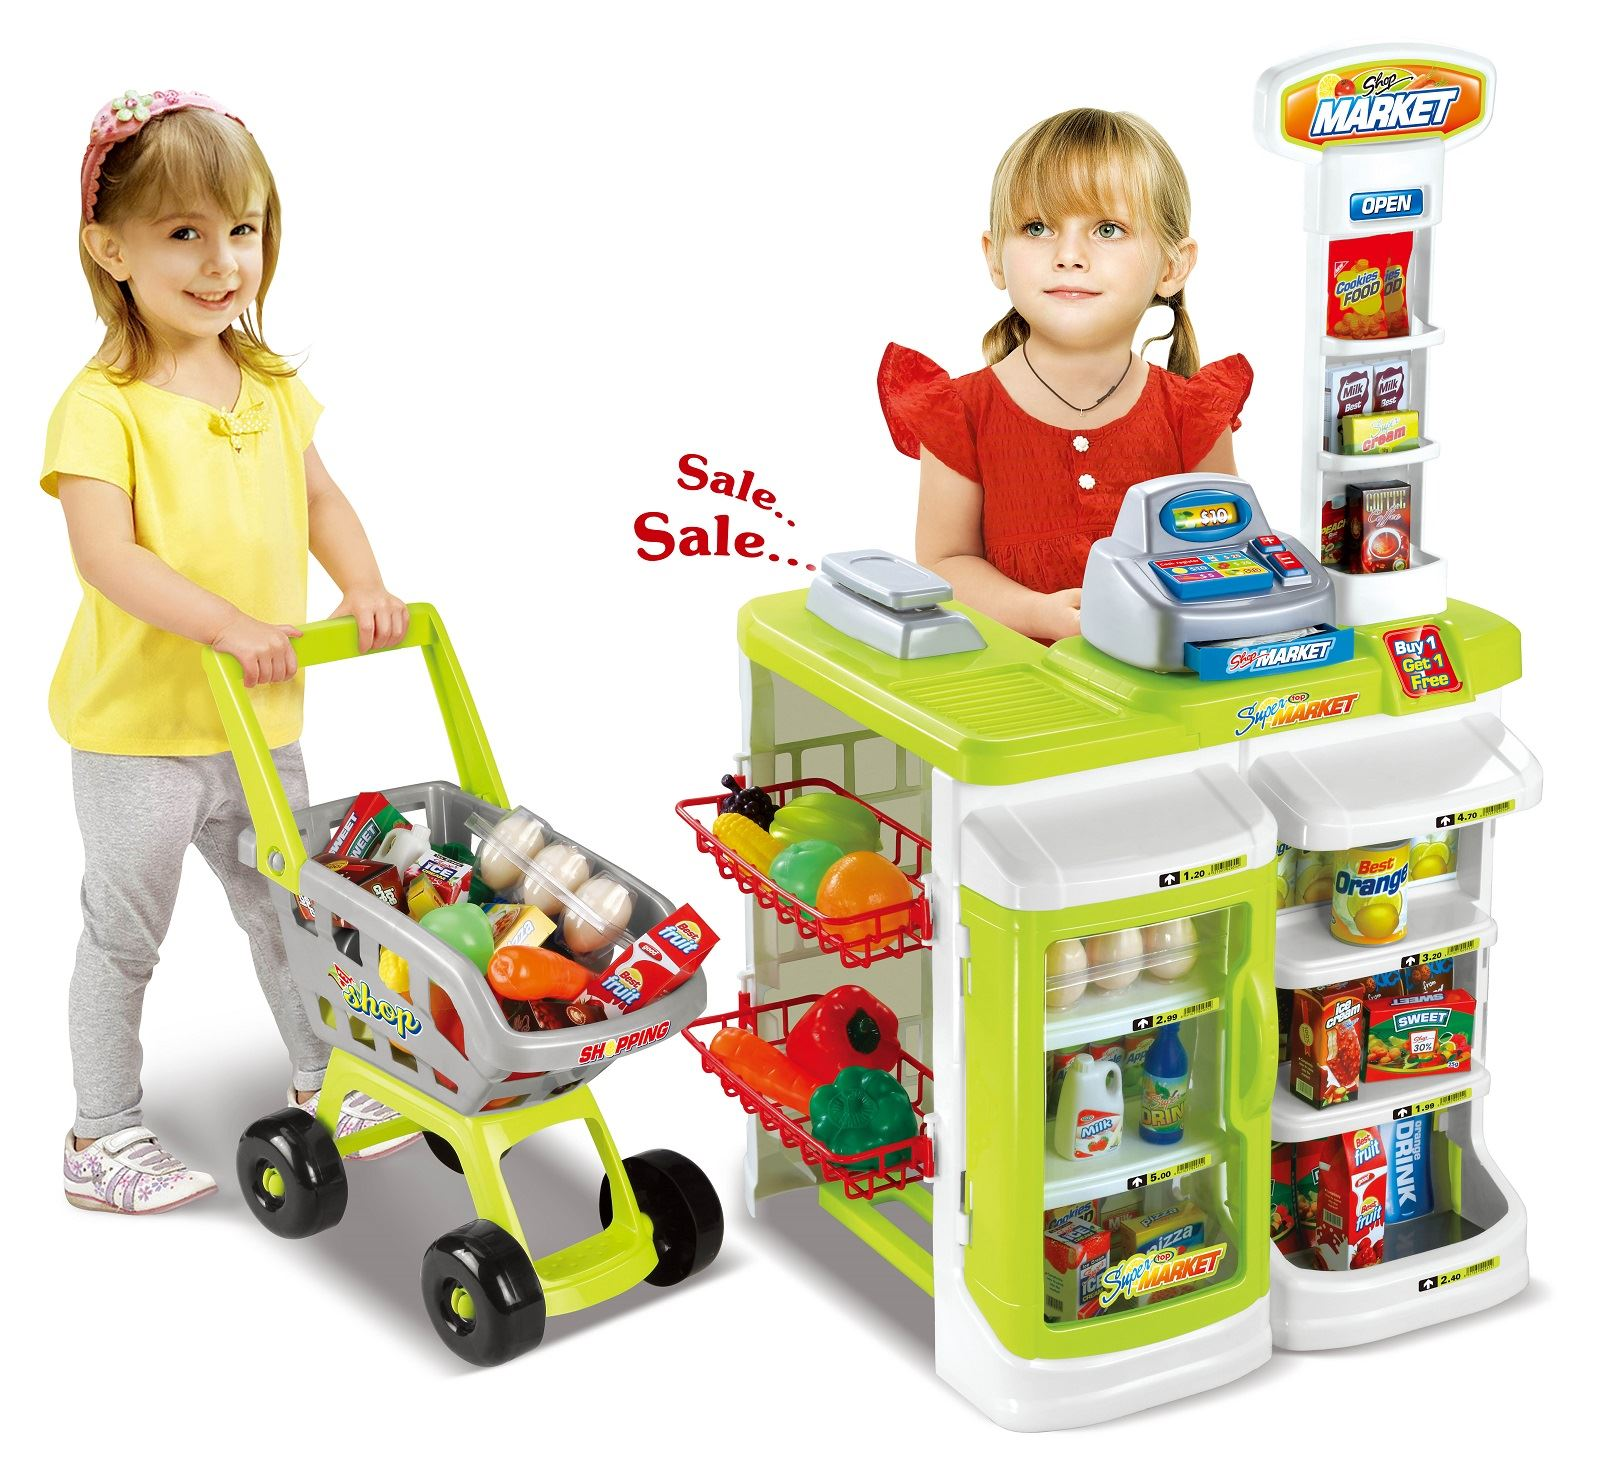 Childrens Kids Pretend Play Supermarket Grocery Shopping Shop